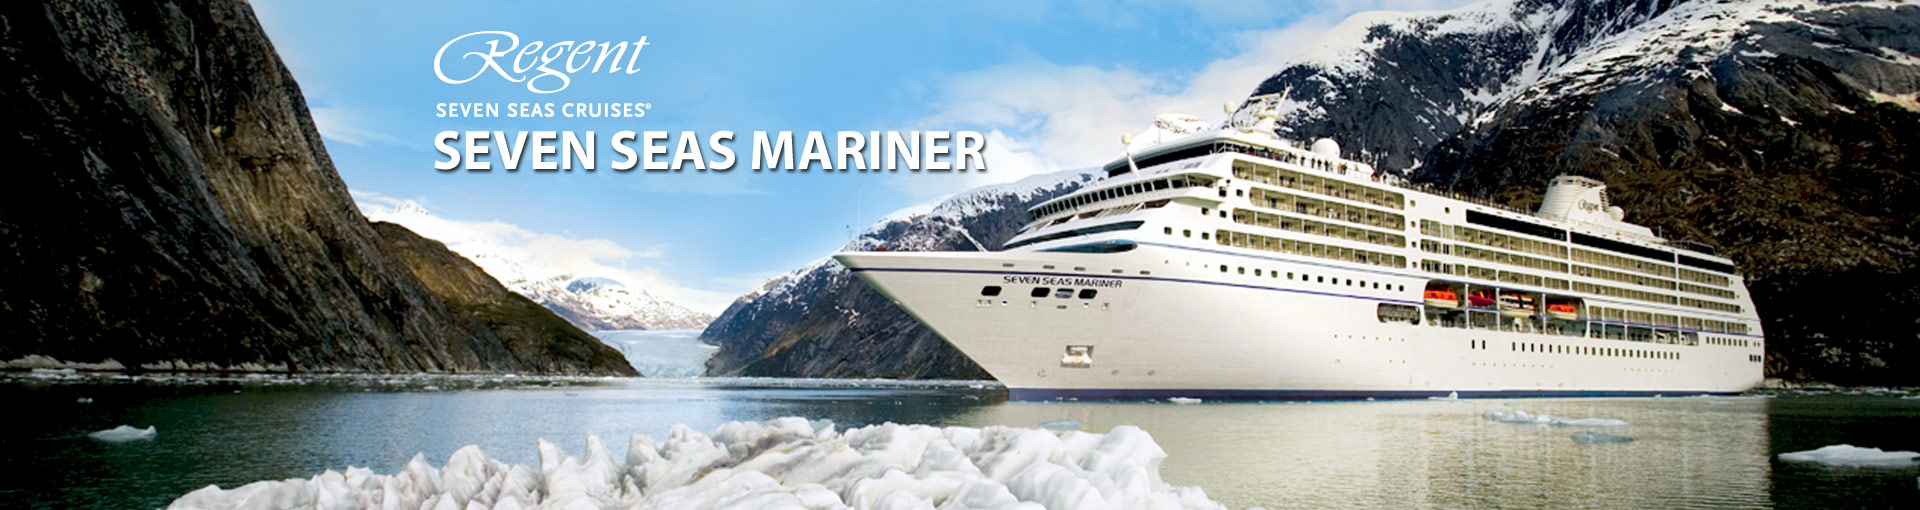 Regent Seven Seas Mariner cruise ship